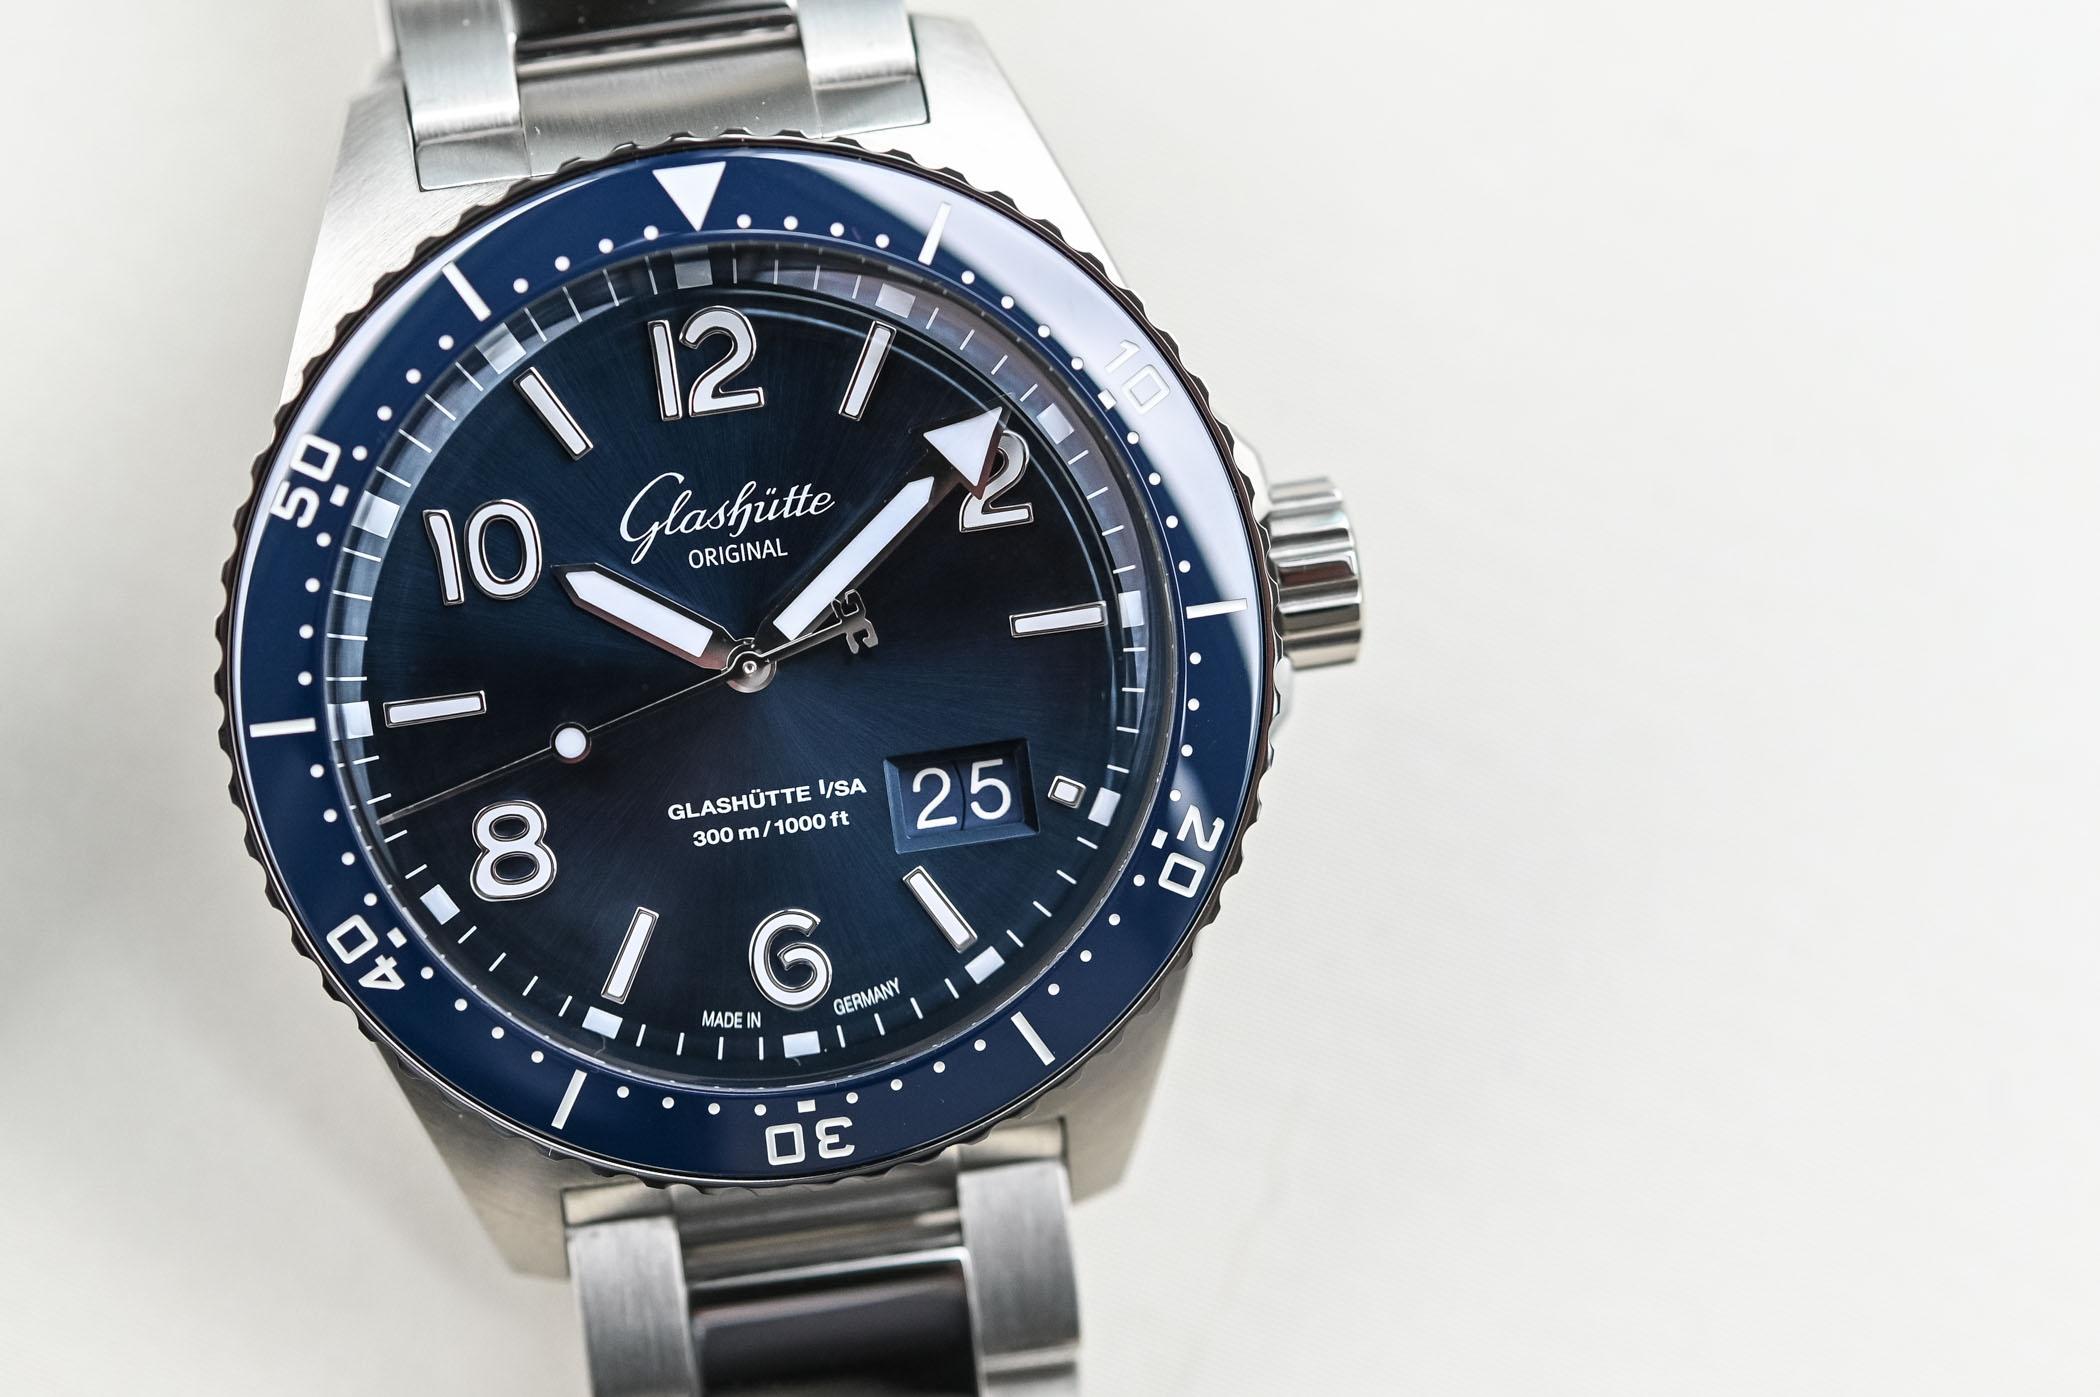 Glashutte Original SeaQ Panorama Date - Dive Watch Review